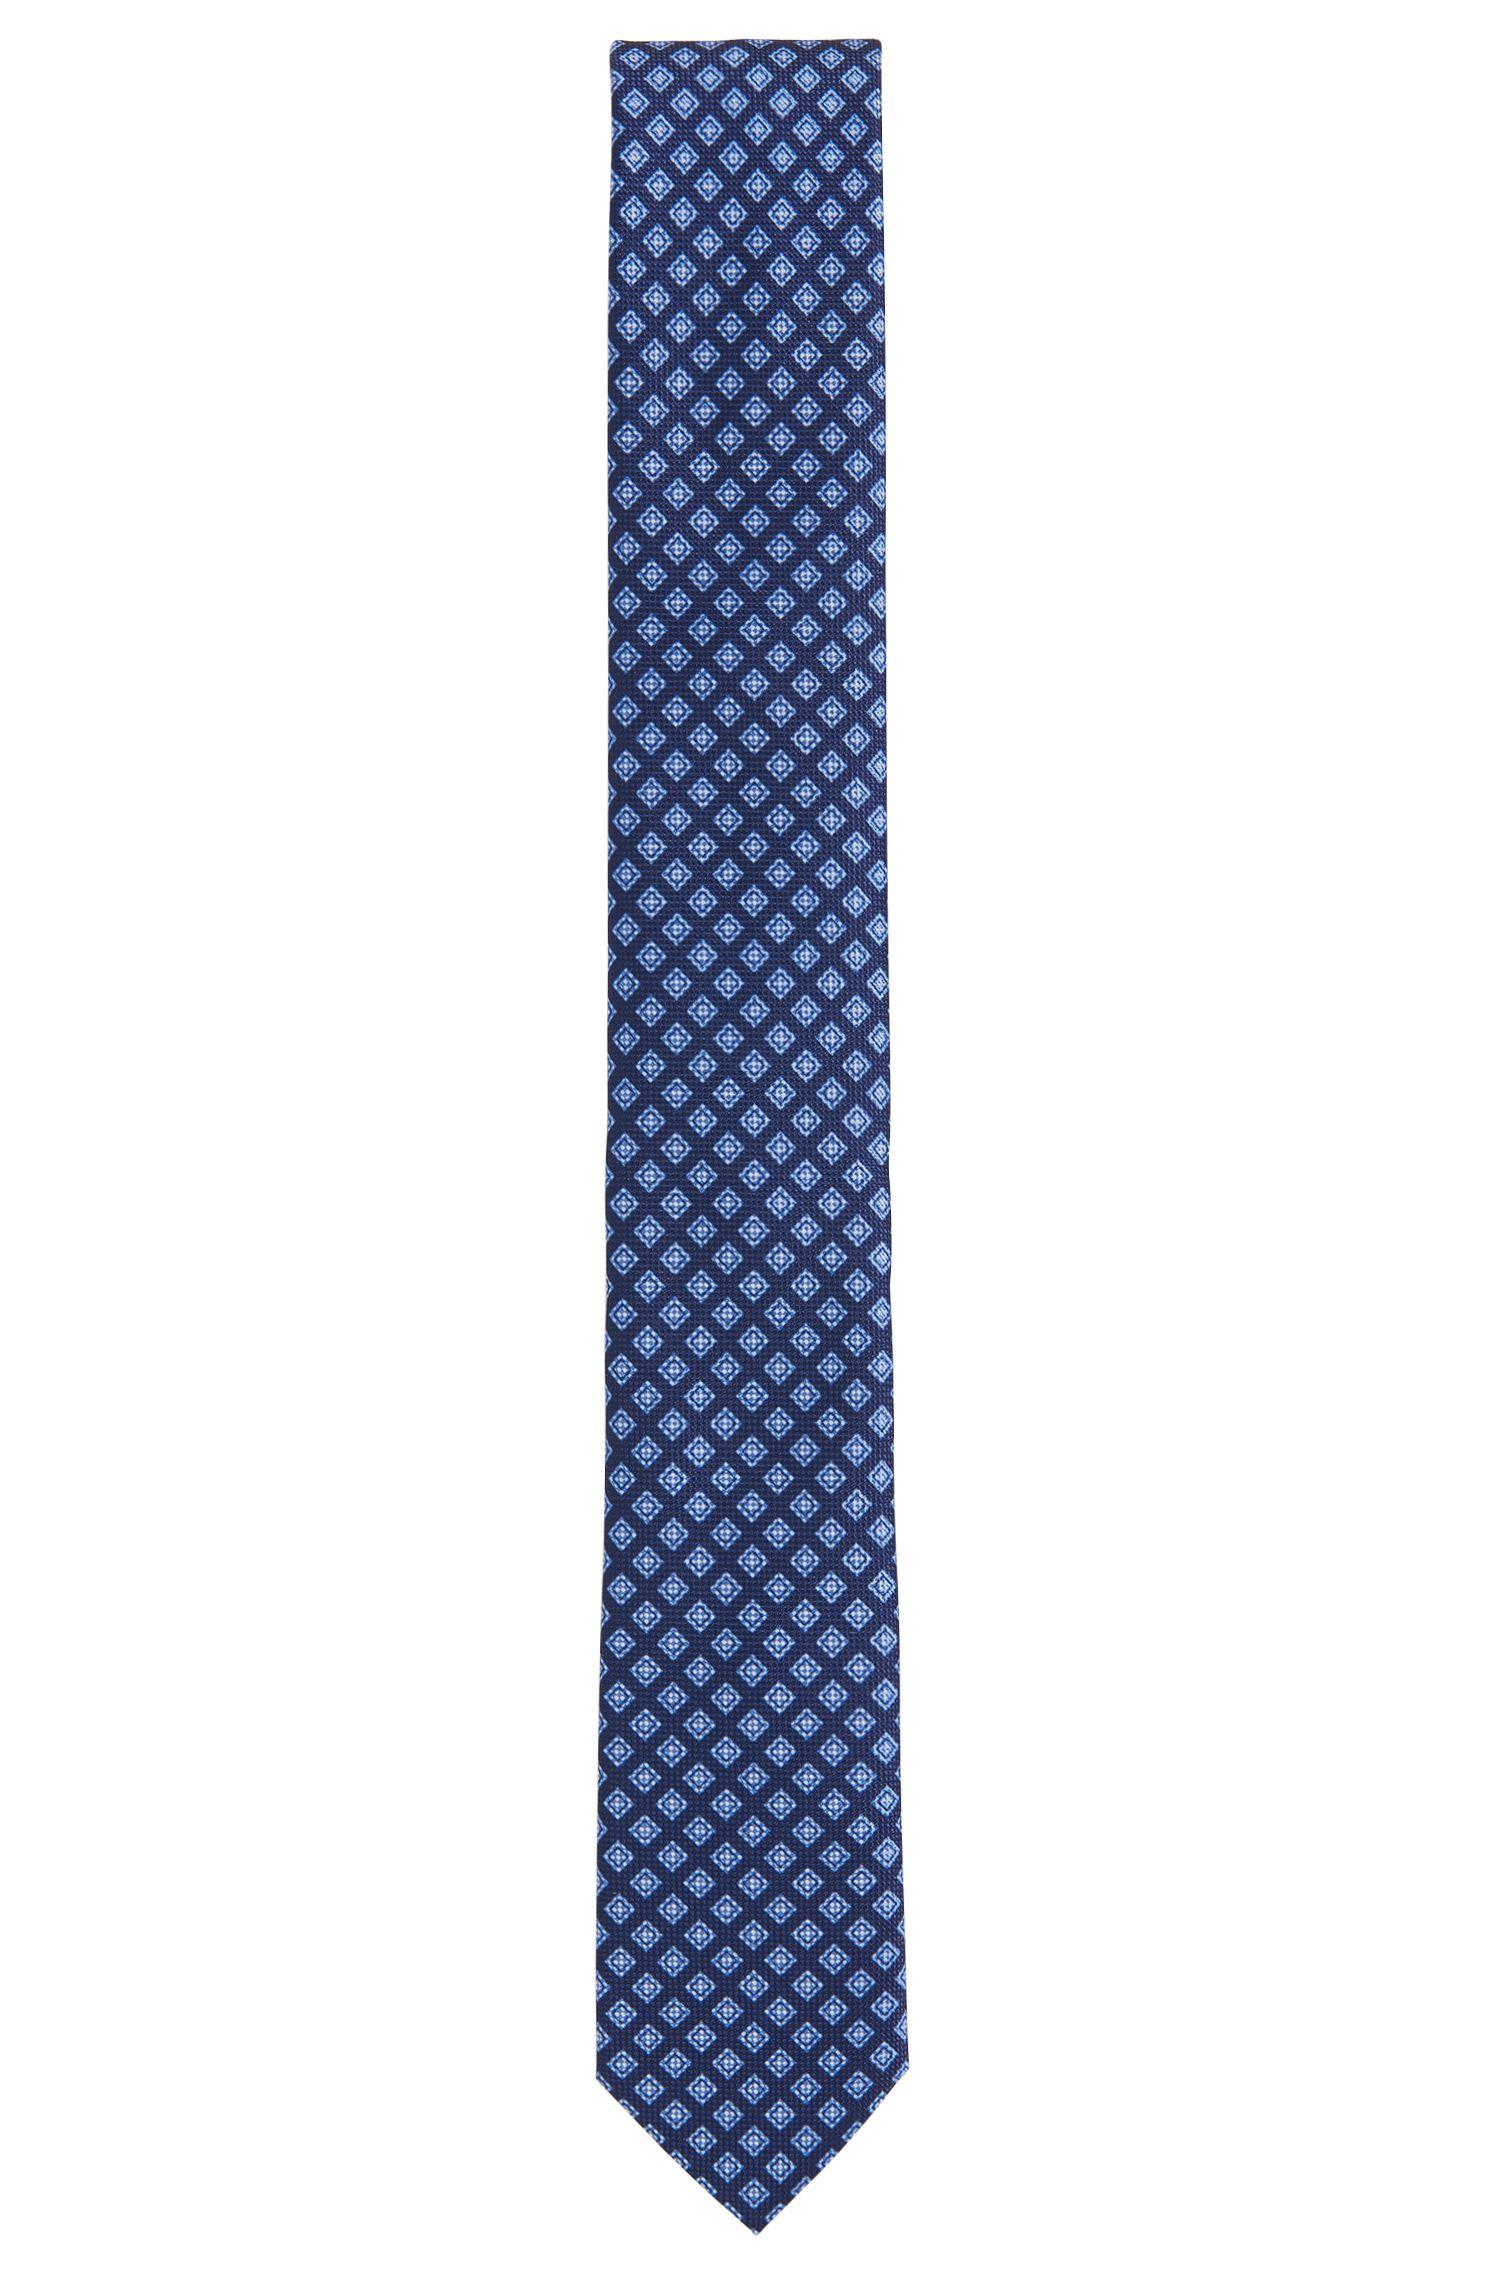 Patterned Italian Silk Slim Tie